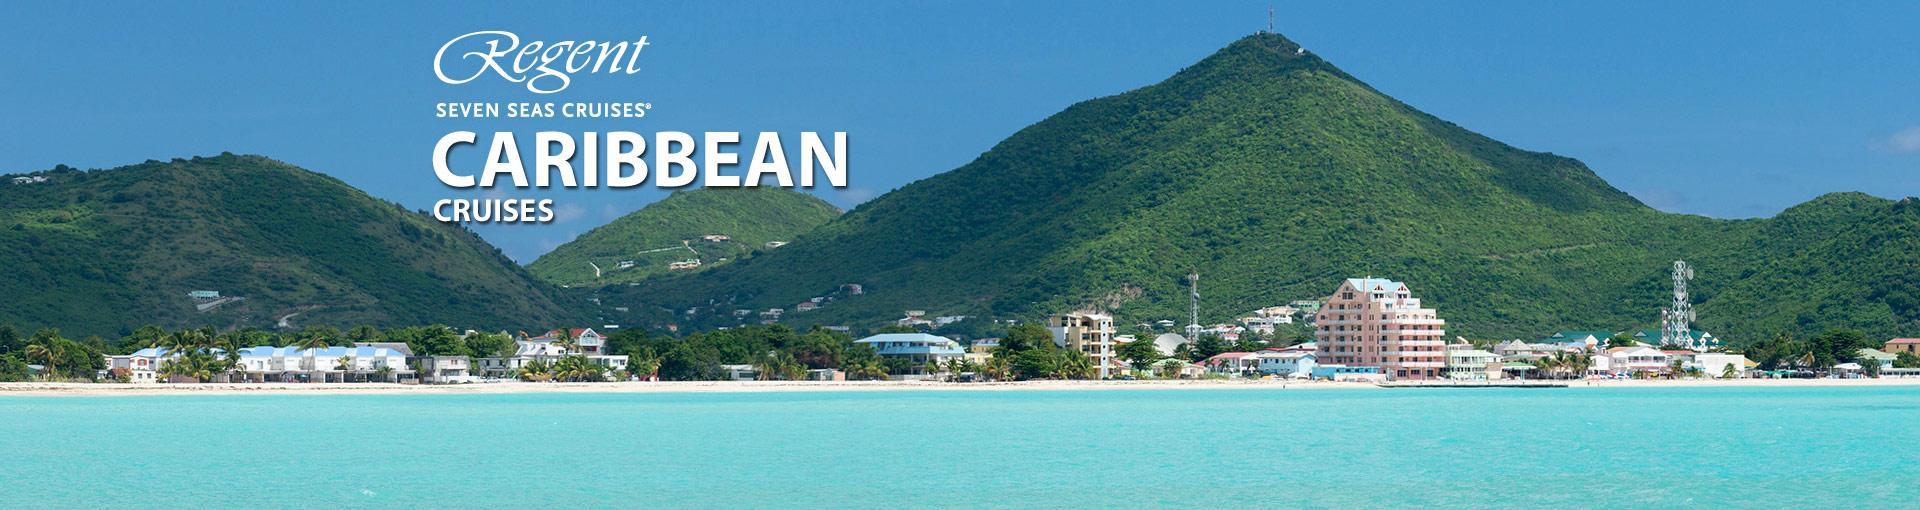 Regent Seven Seas Cruises Caribbean Cruises